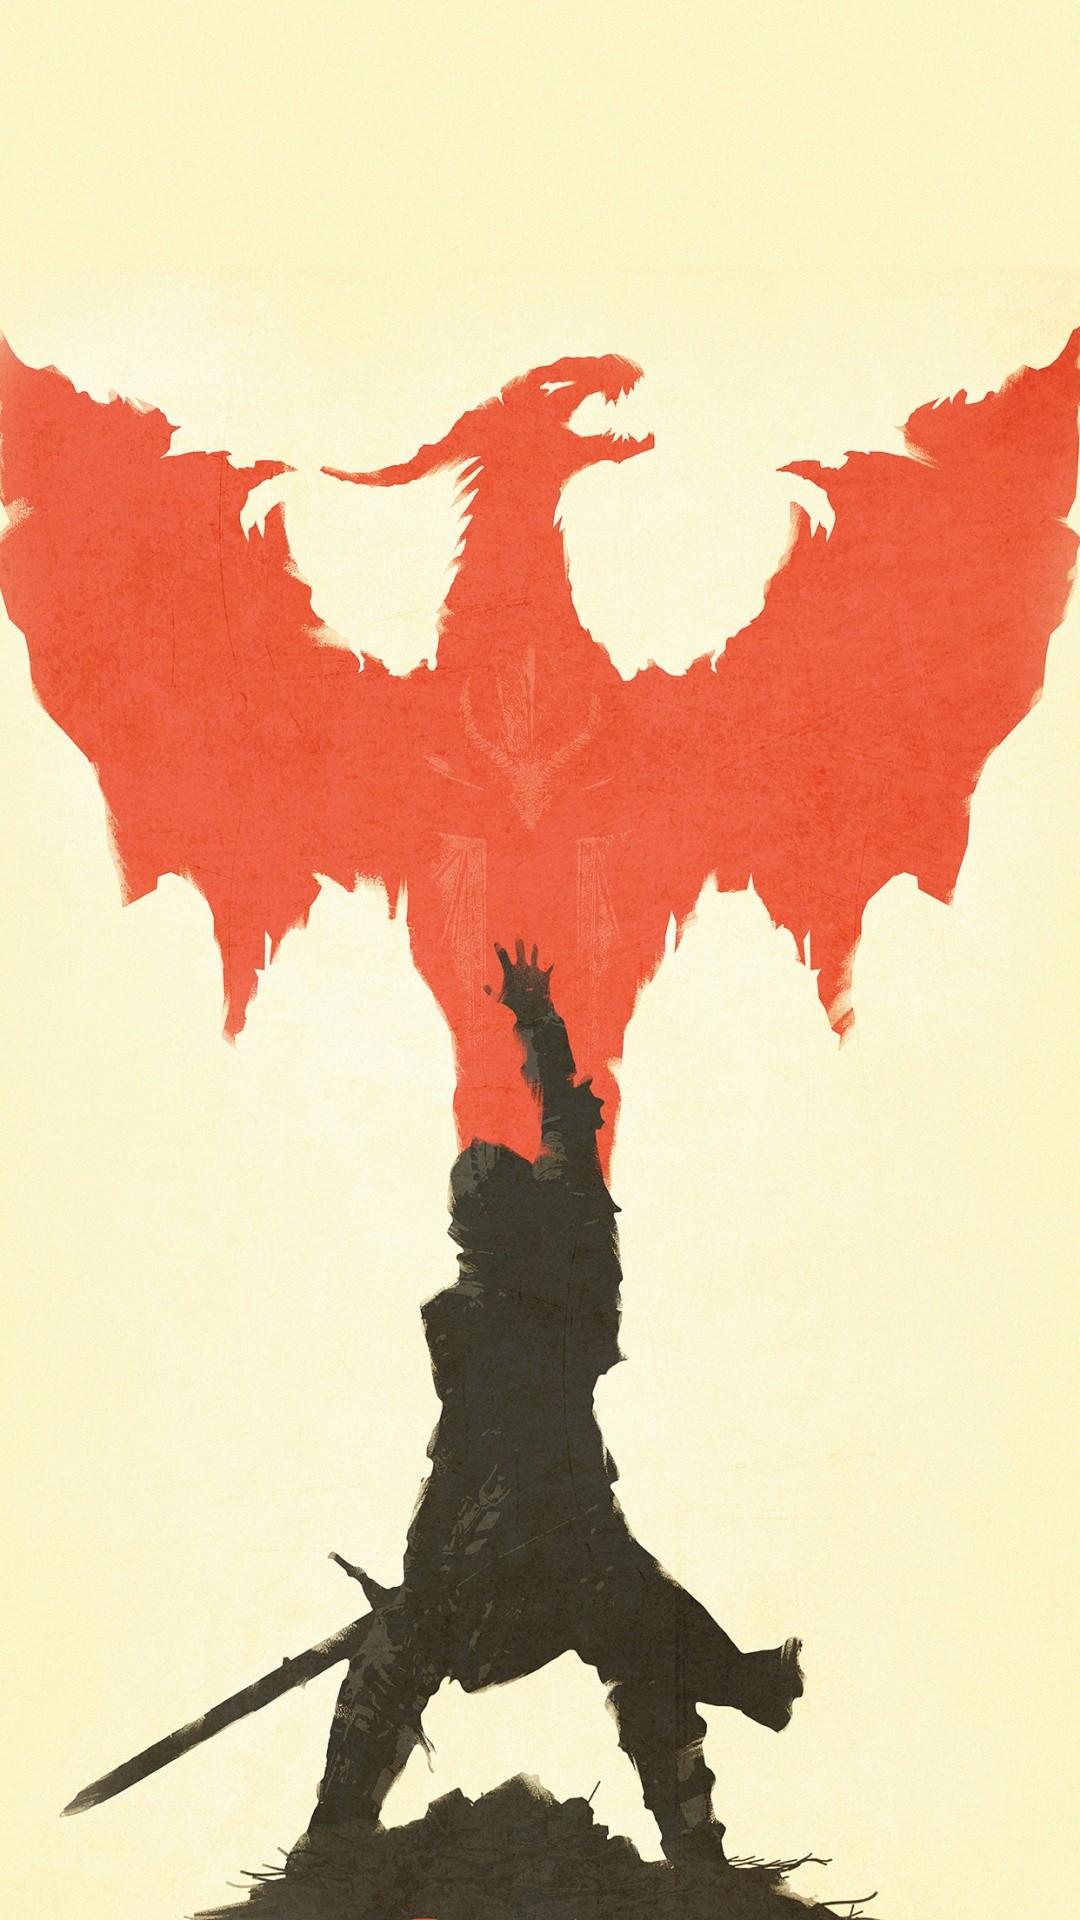 Dragon Age Illustration iPhone 6+ HD Wallpaper